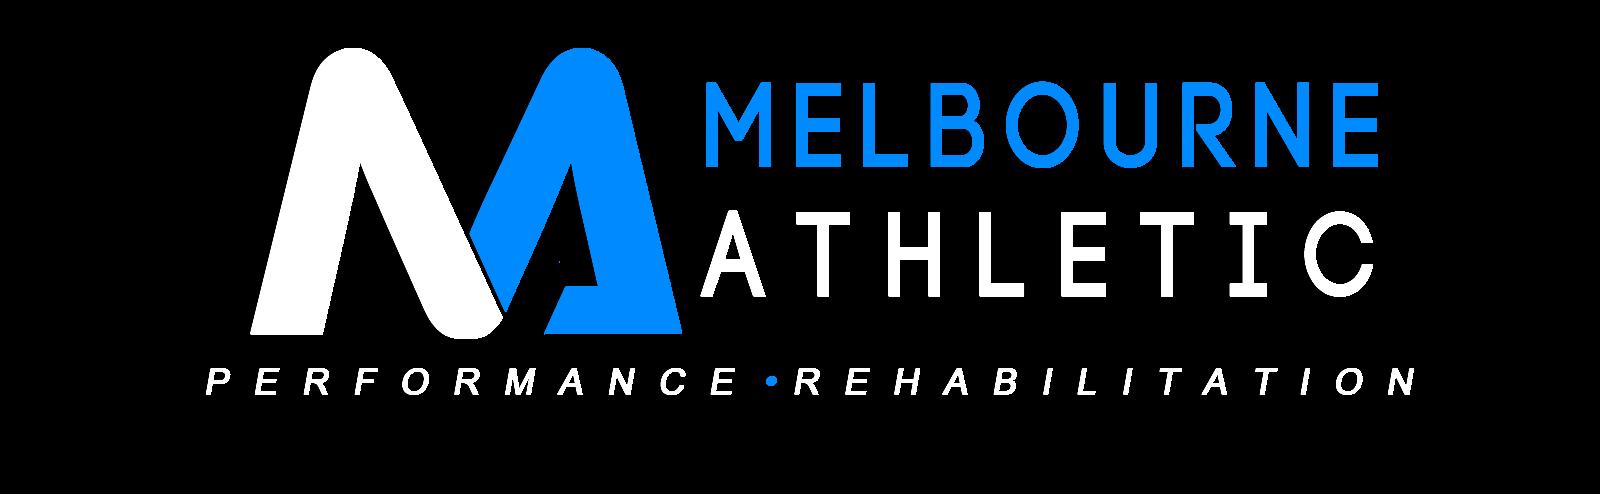 Melbourne Athletic